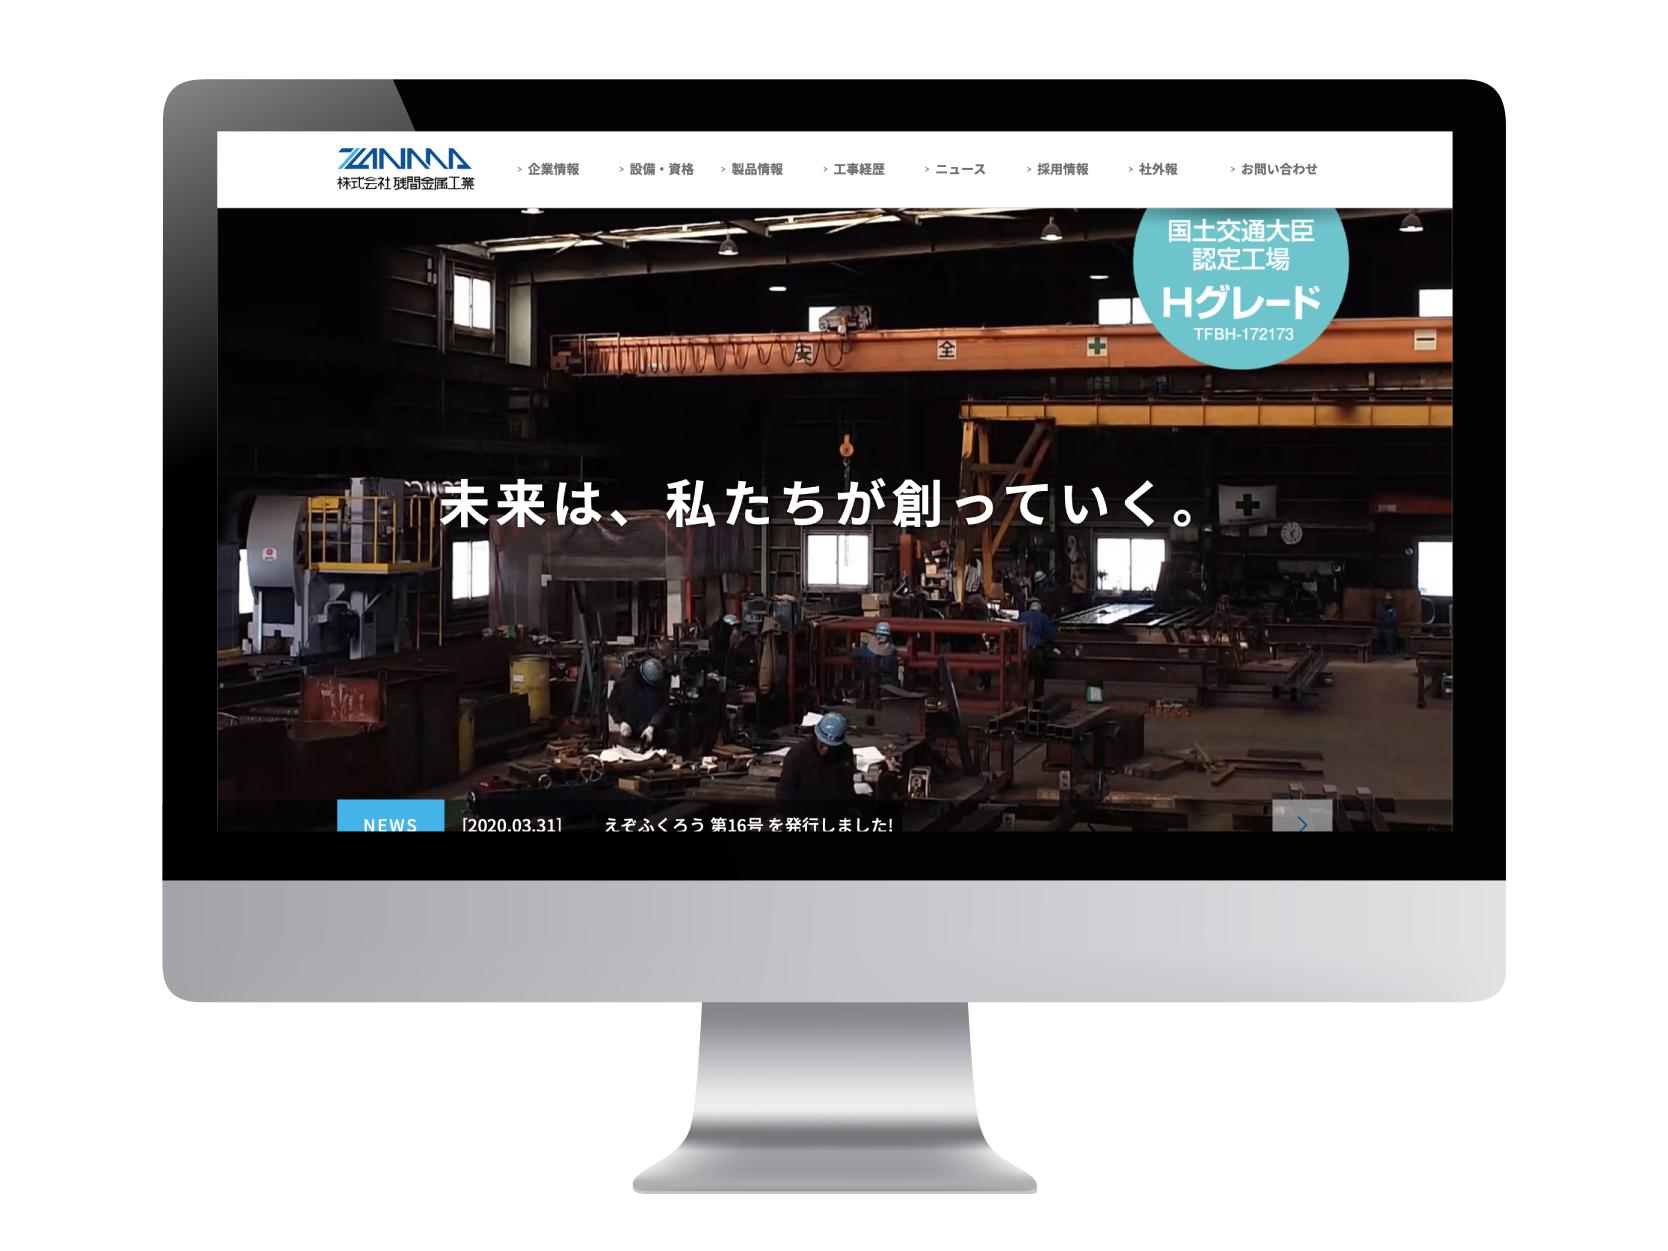 <span>Official web site</span><br>株式会社 残間金属工業